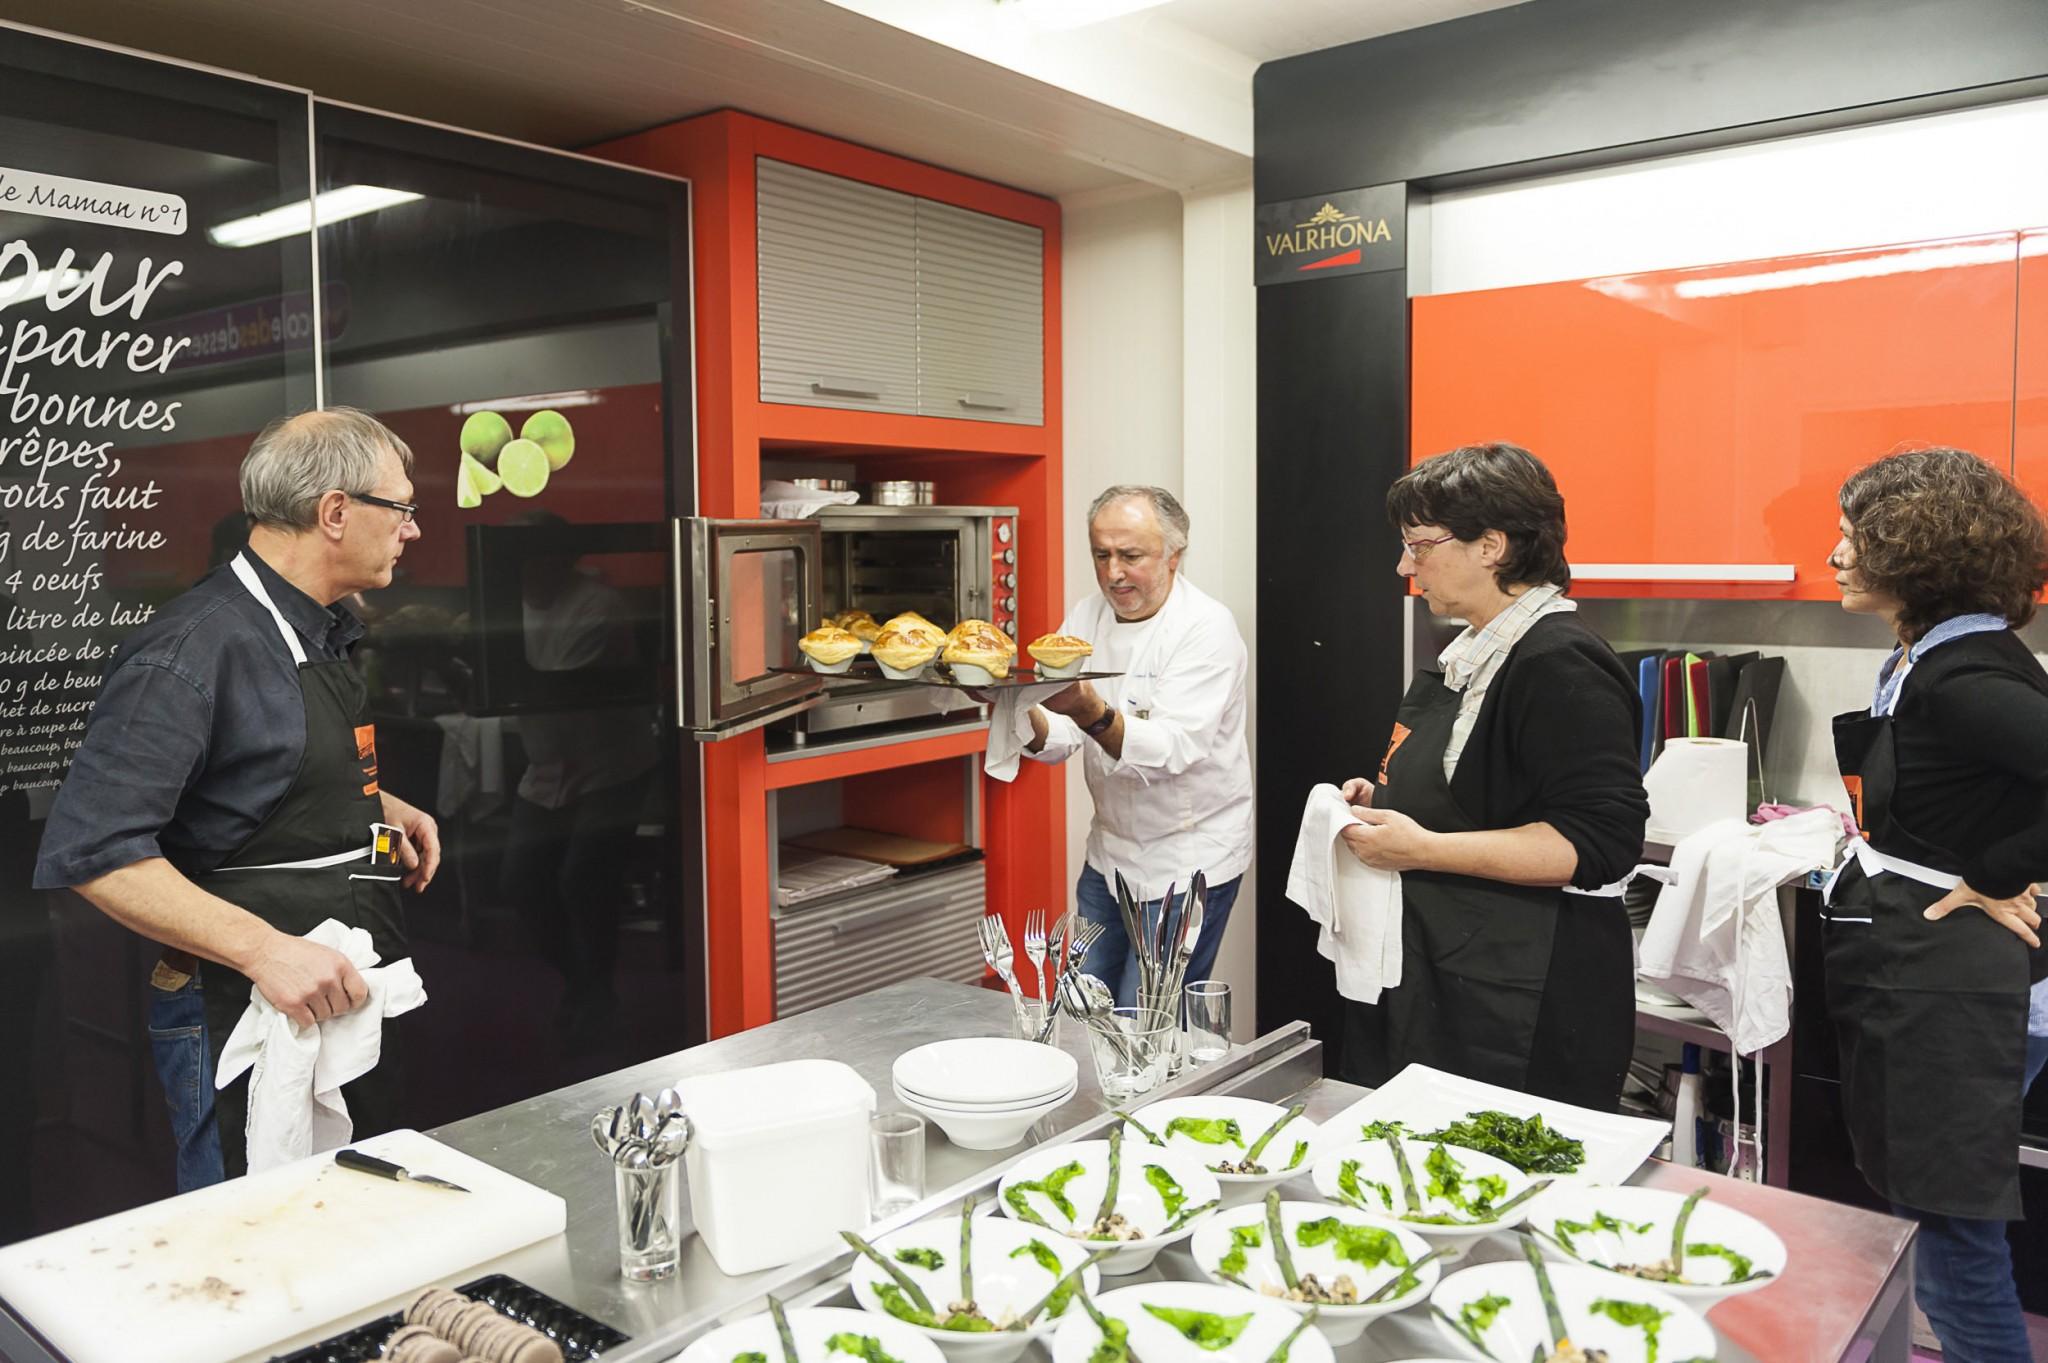 cours de cuisine, Alain Chartier et Bernard Rambaud